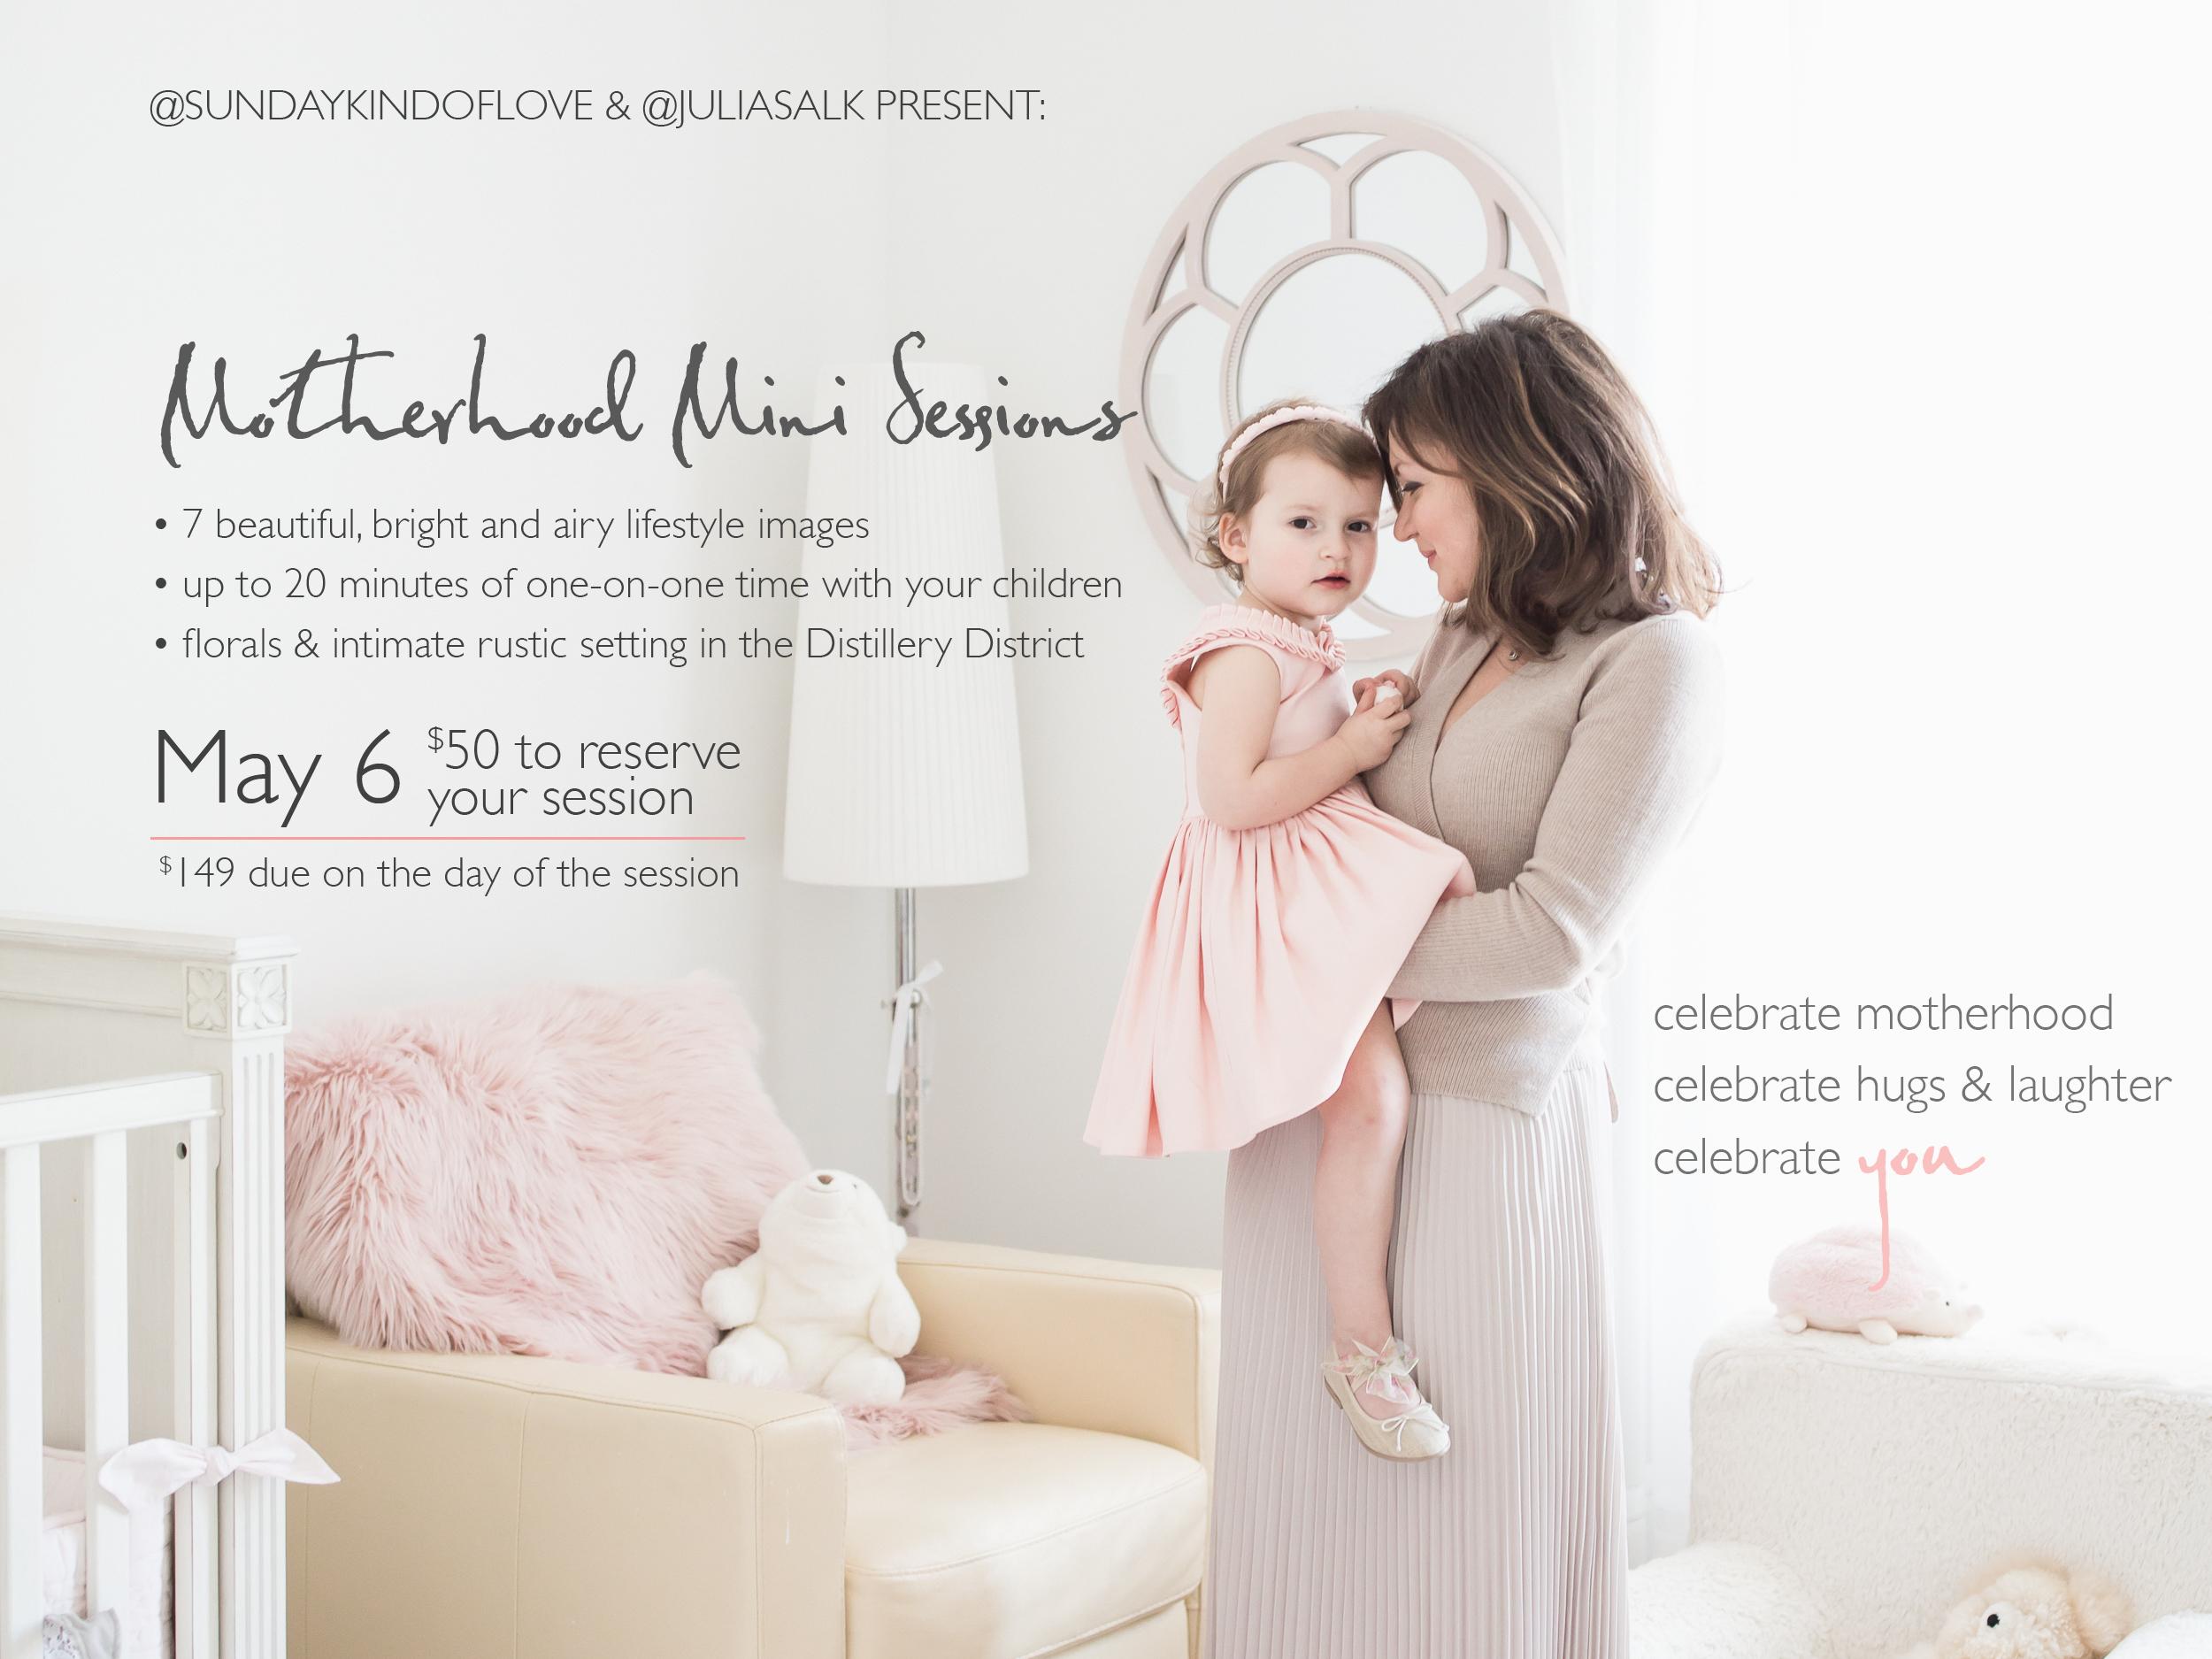 Motherhood Minis in Toronto - Mother's Day Photos